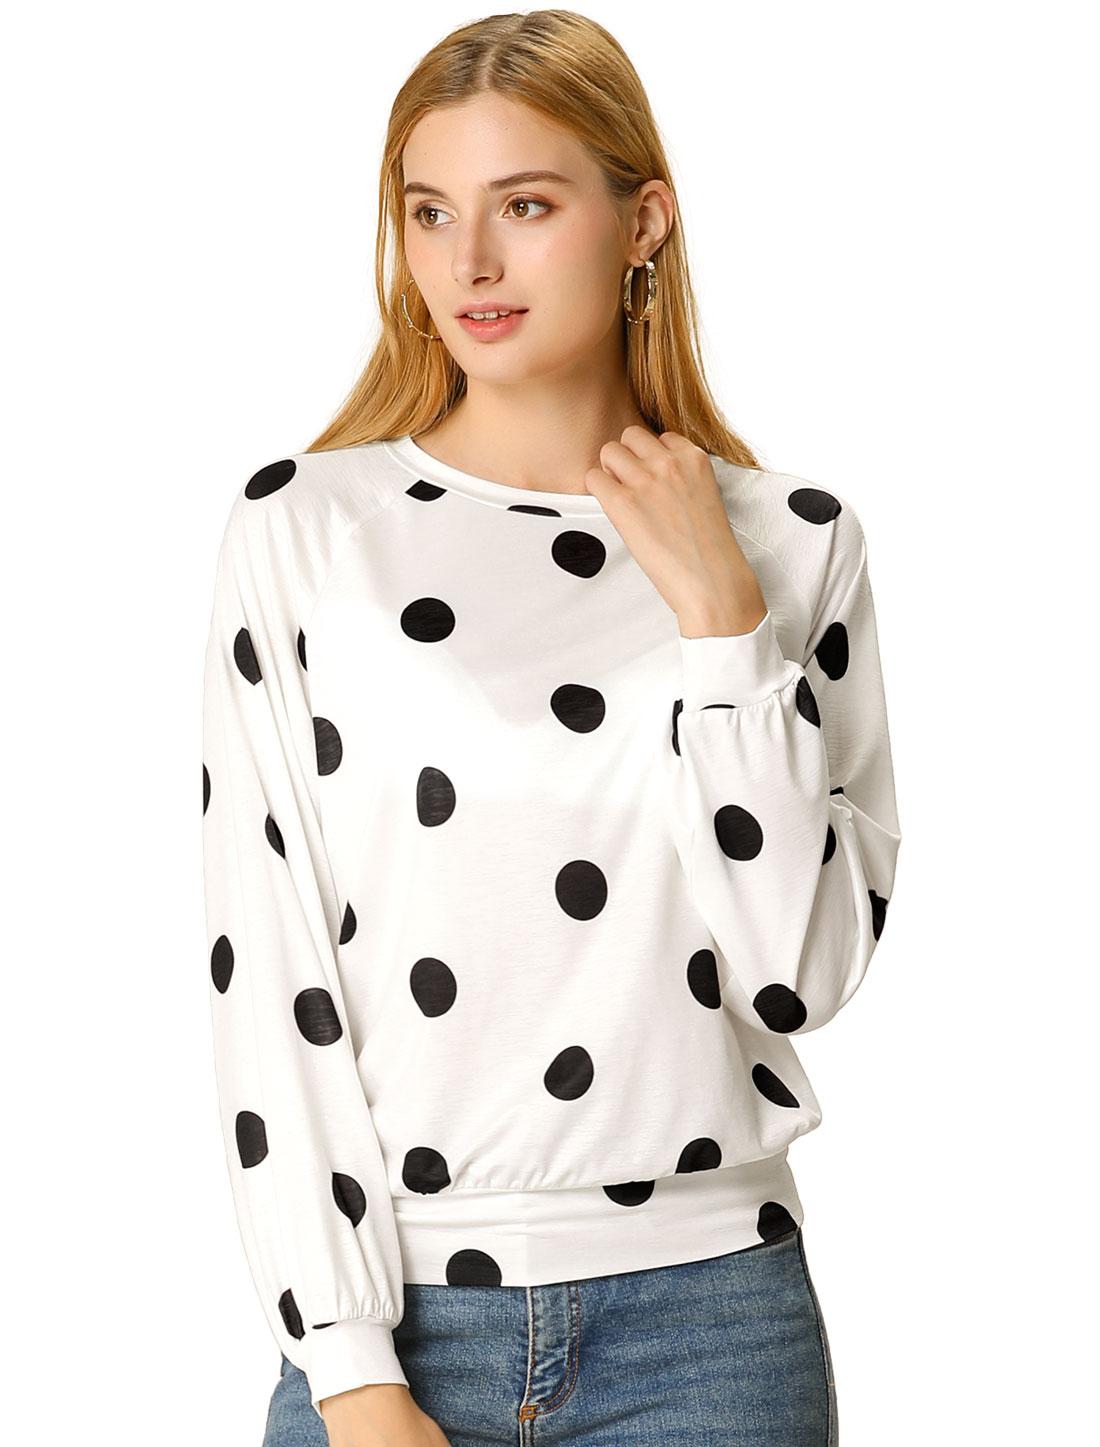 Women's Loose Casual Polka Dot Long Sleeve Top White-Black S